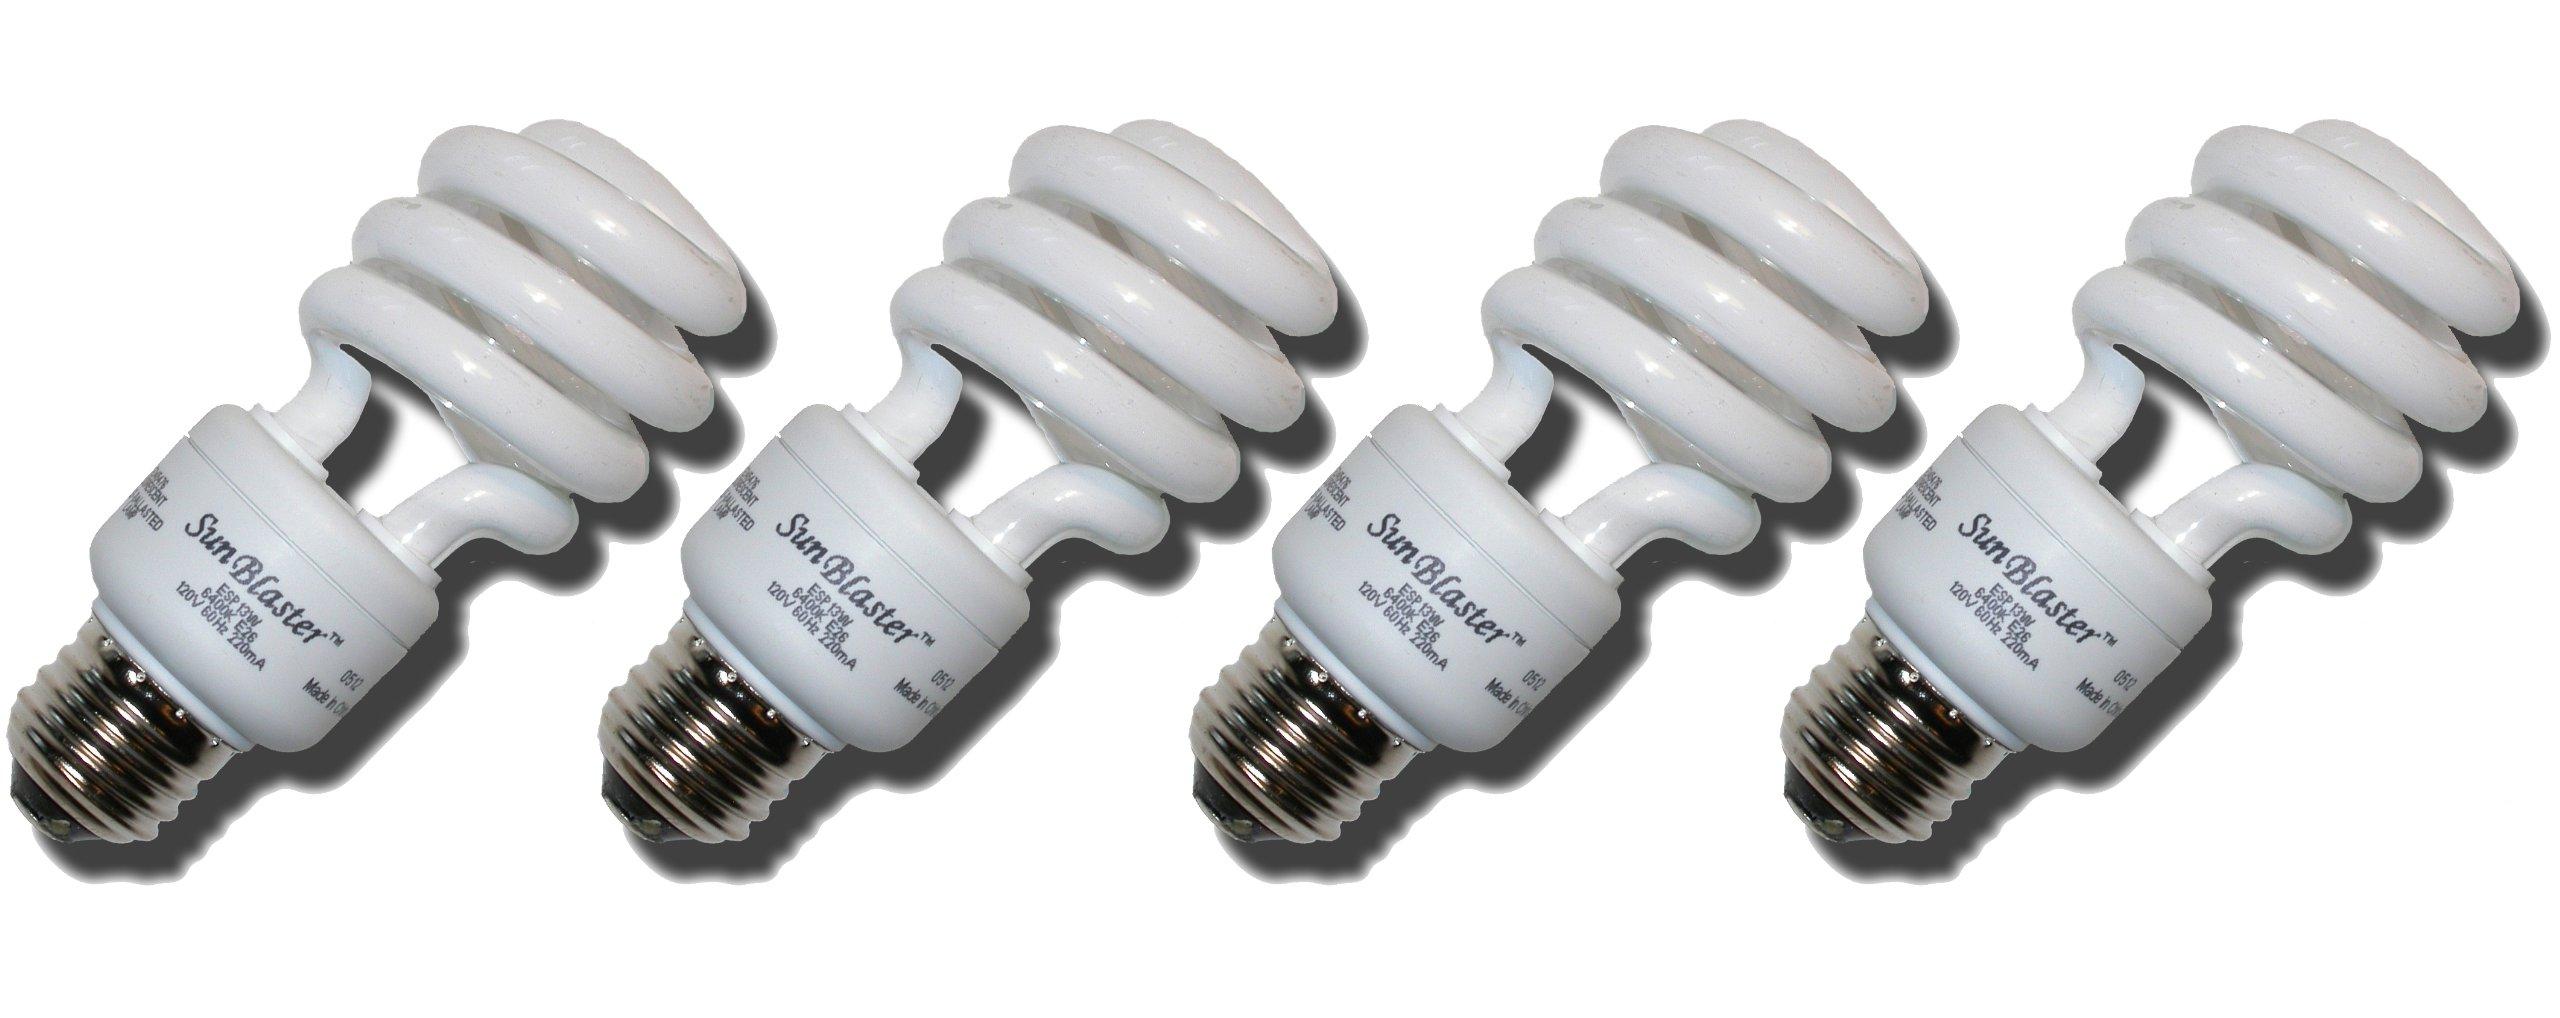 cfl grow light compact fluorescent light 13 watt 4 pack of 6400k full. Black Bedroom Furniture Sets. Home Design Ideas